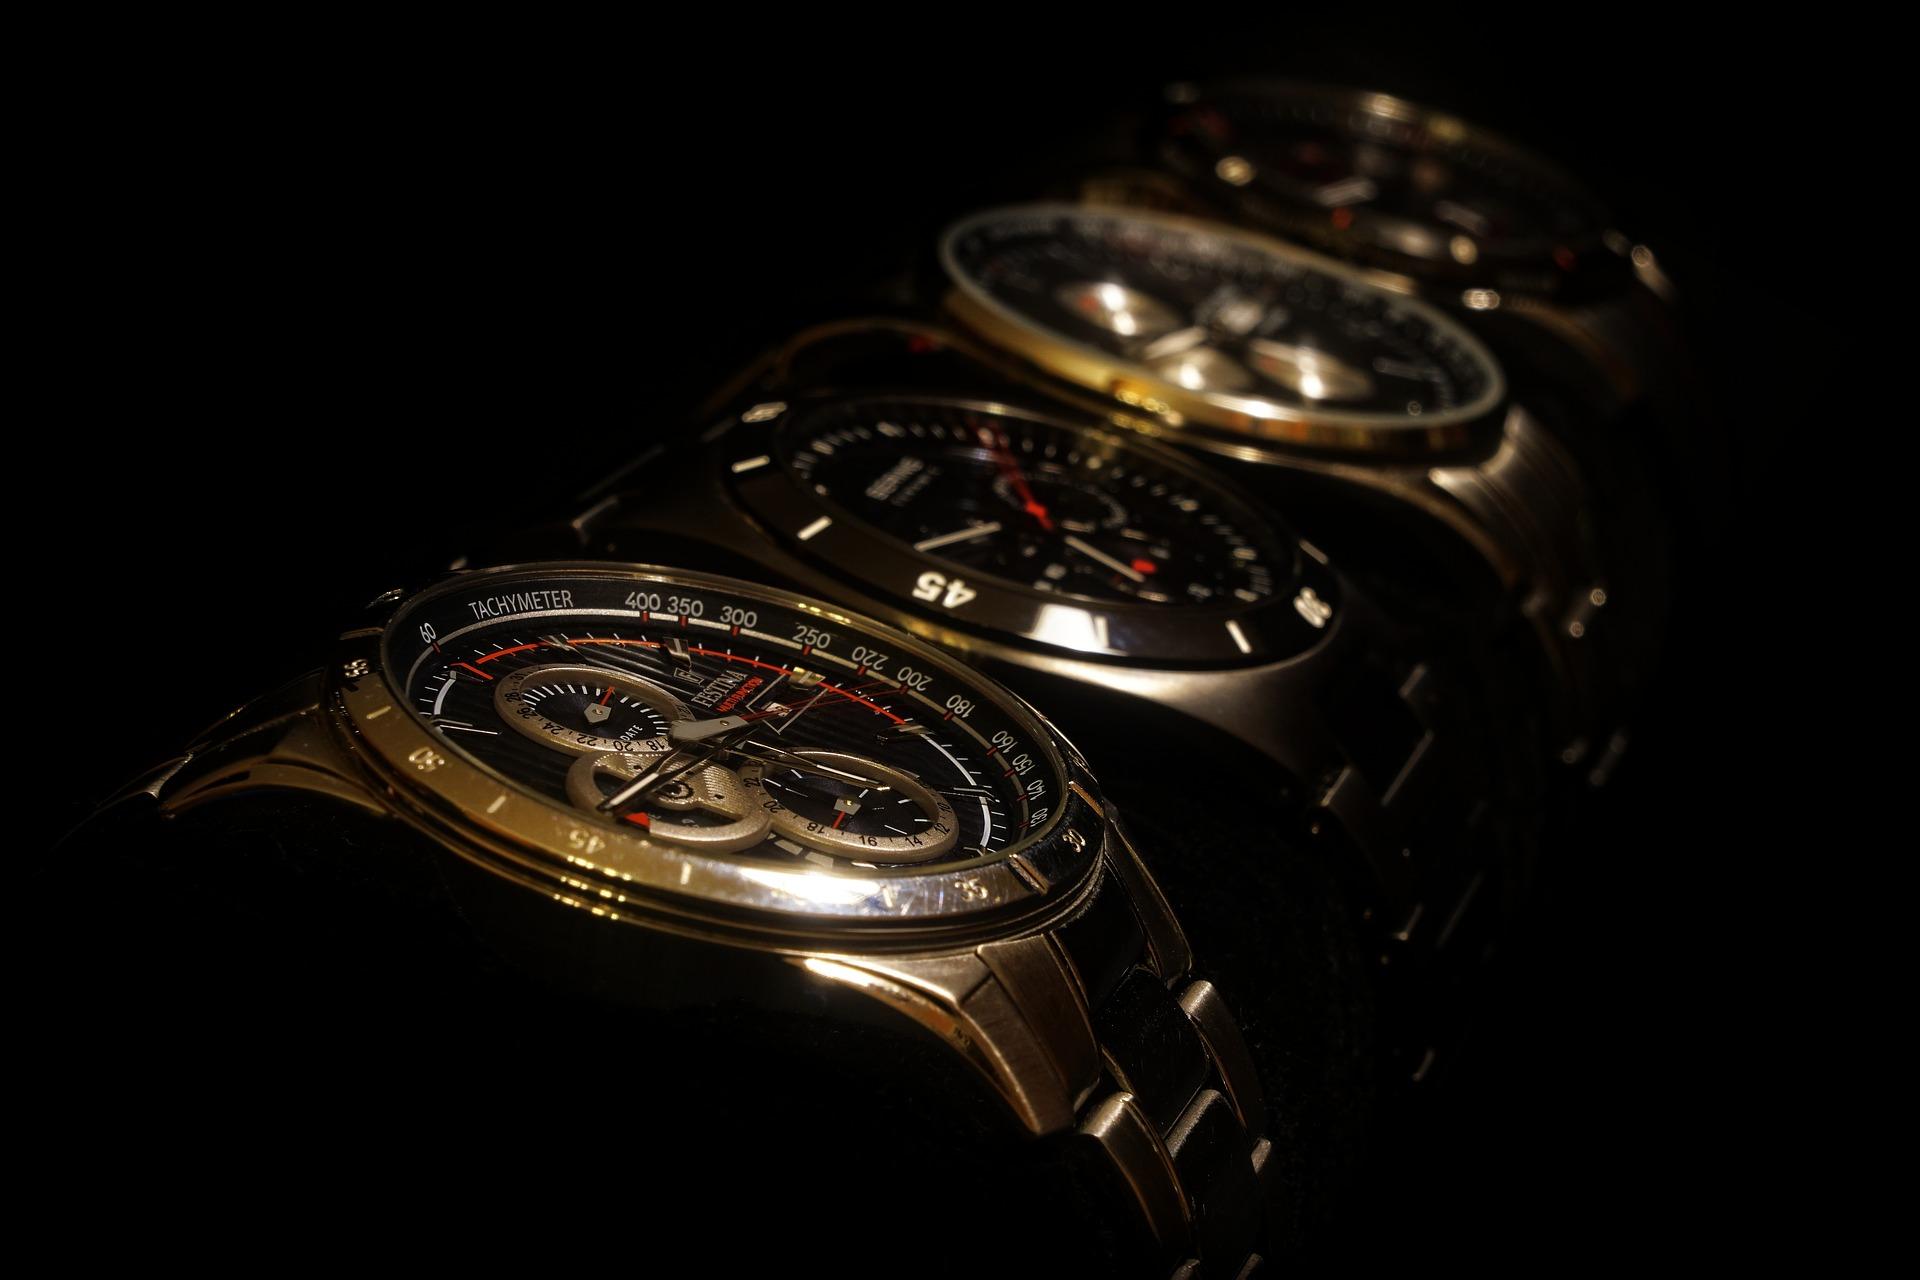 wrist-watch-3072760_1920.jpg